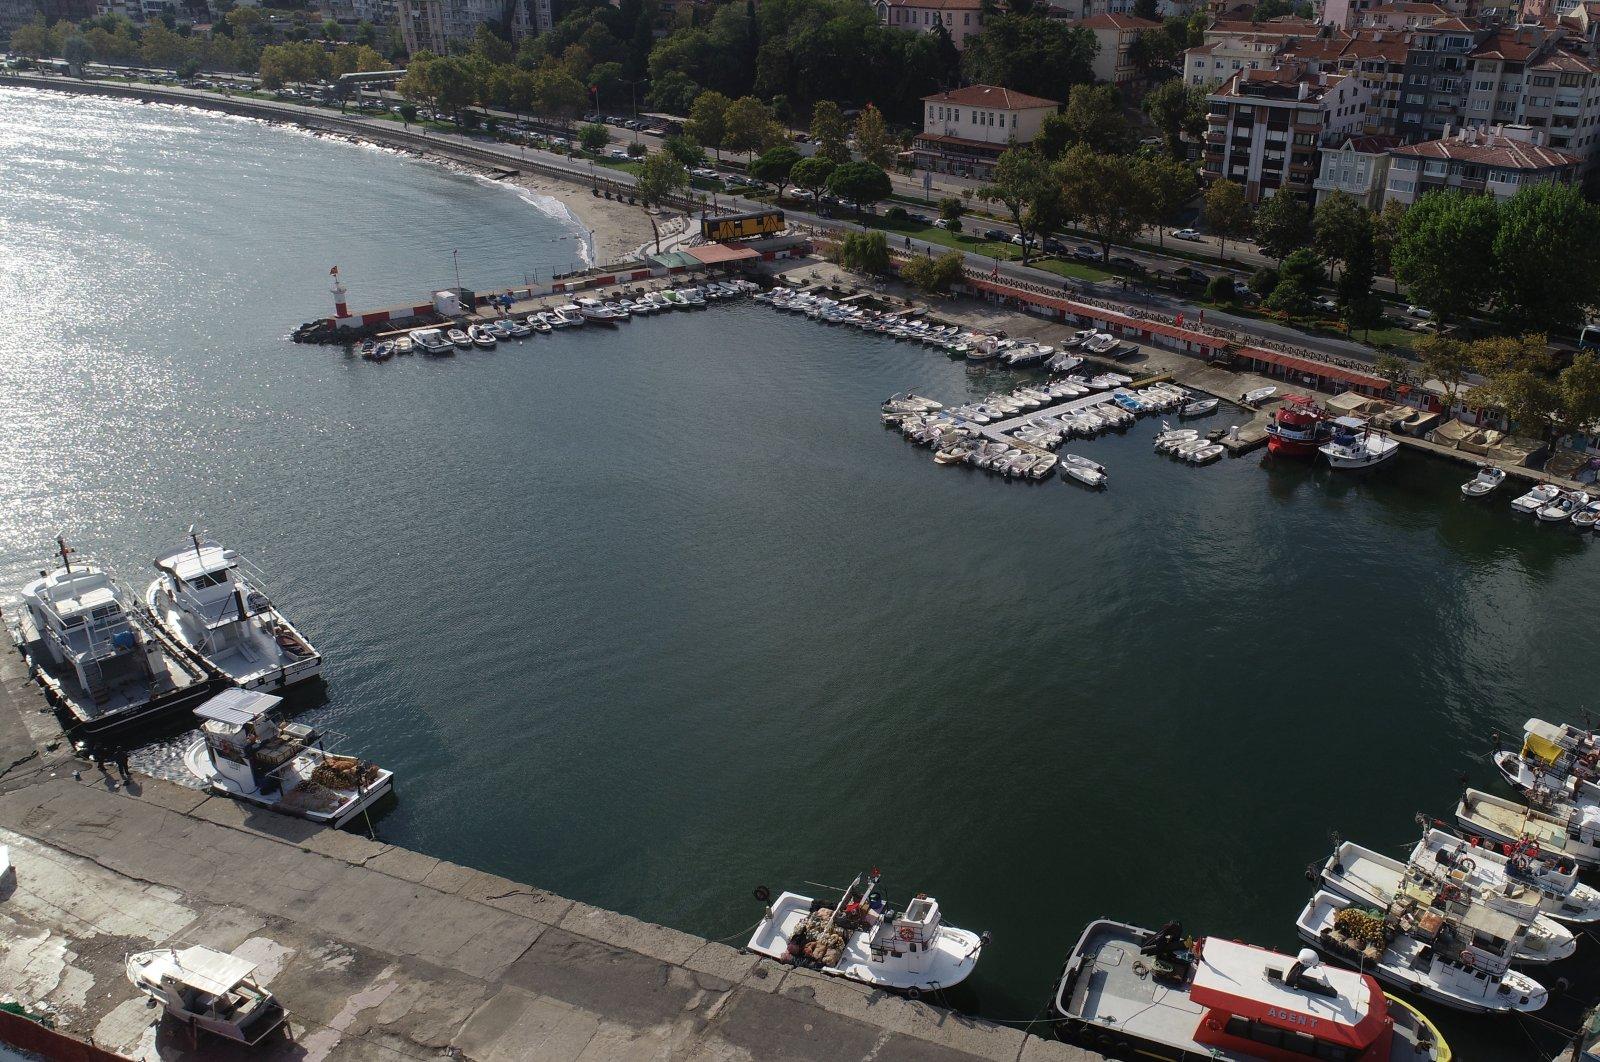 A view of a harbor on the coast of Marmara Sea, in Tekirdağ, northwestern Turkey, Sept. 10, 2021. (AA PHOTO)